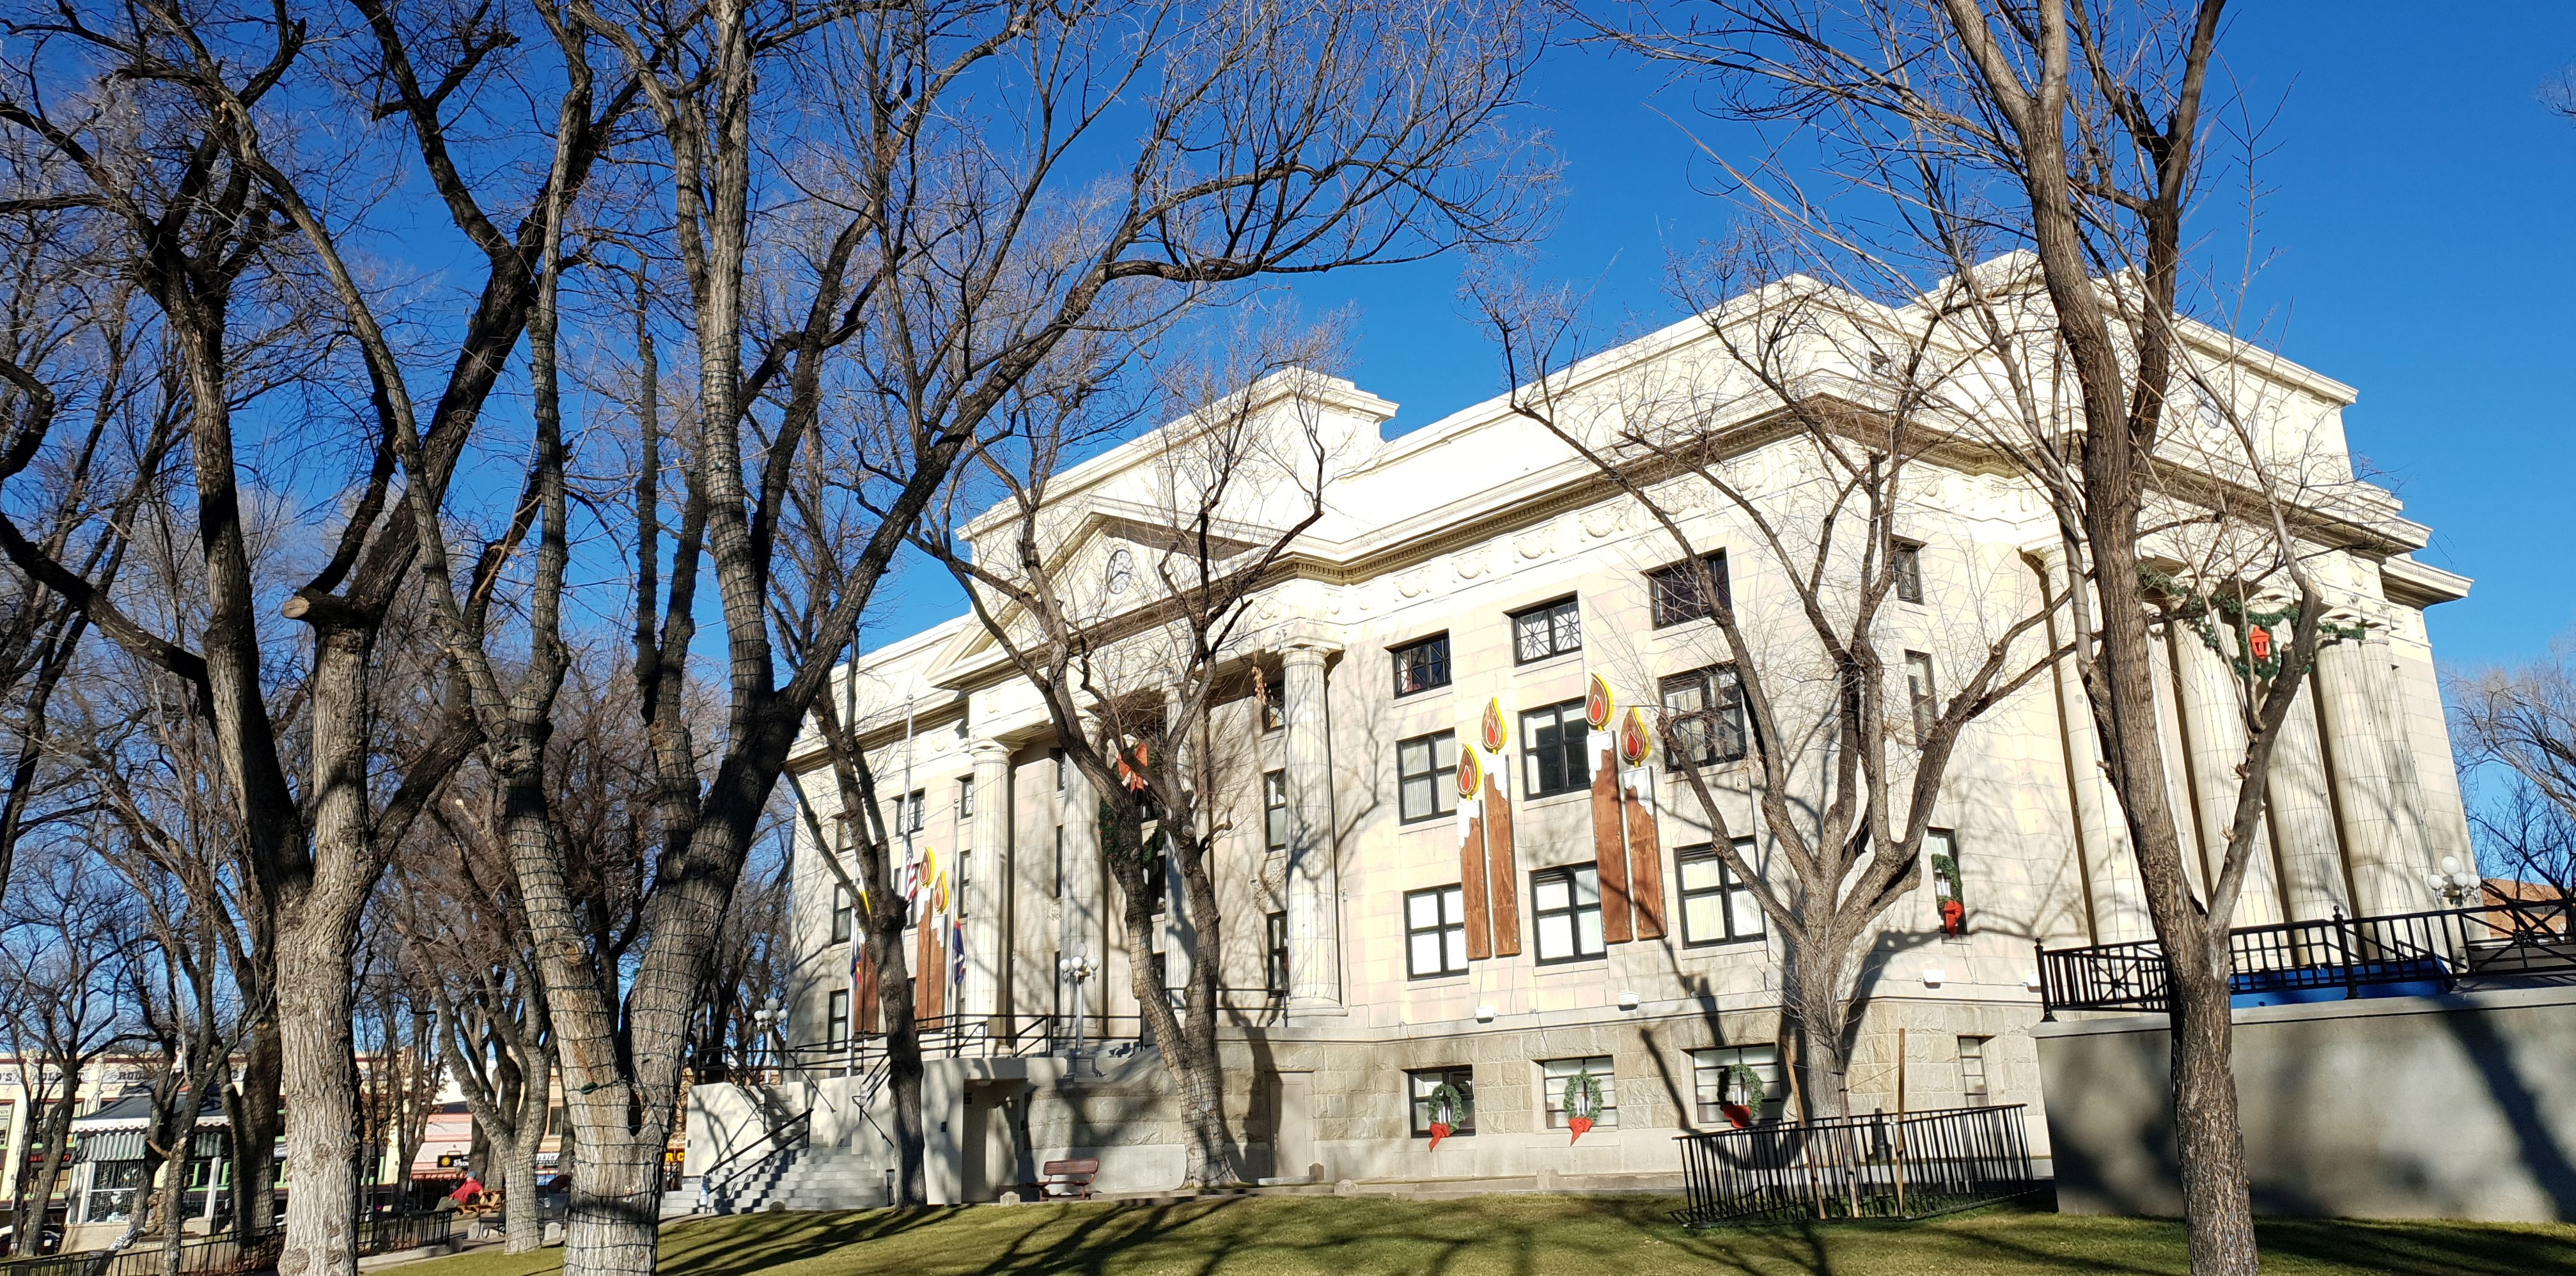 prescott arizona courthouse